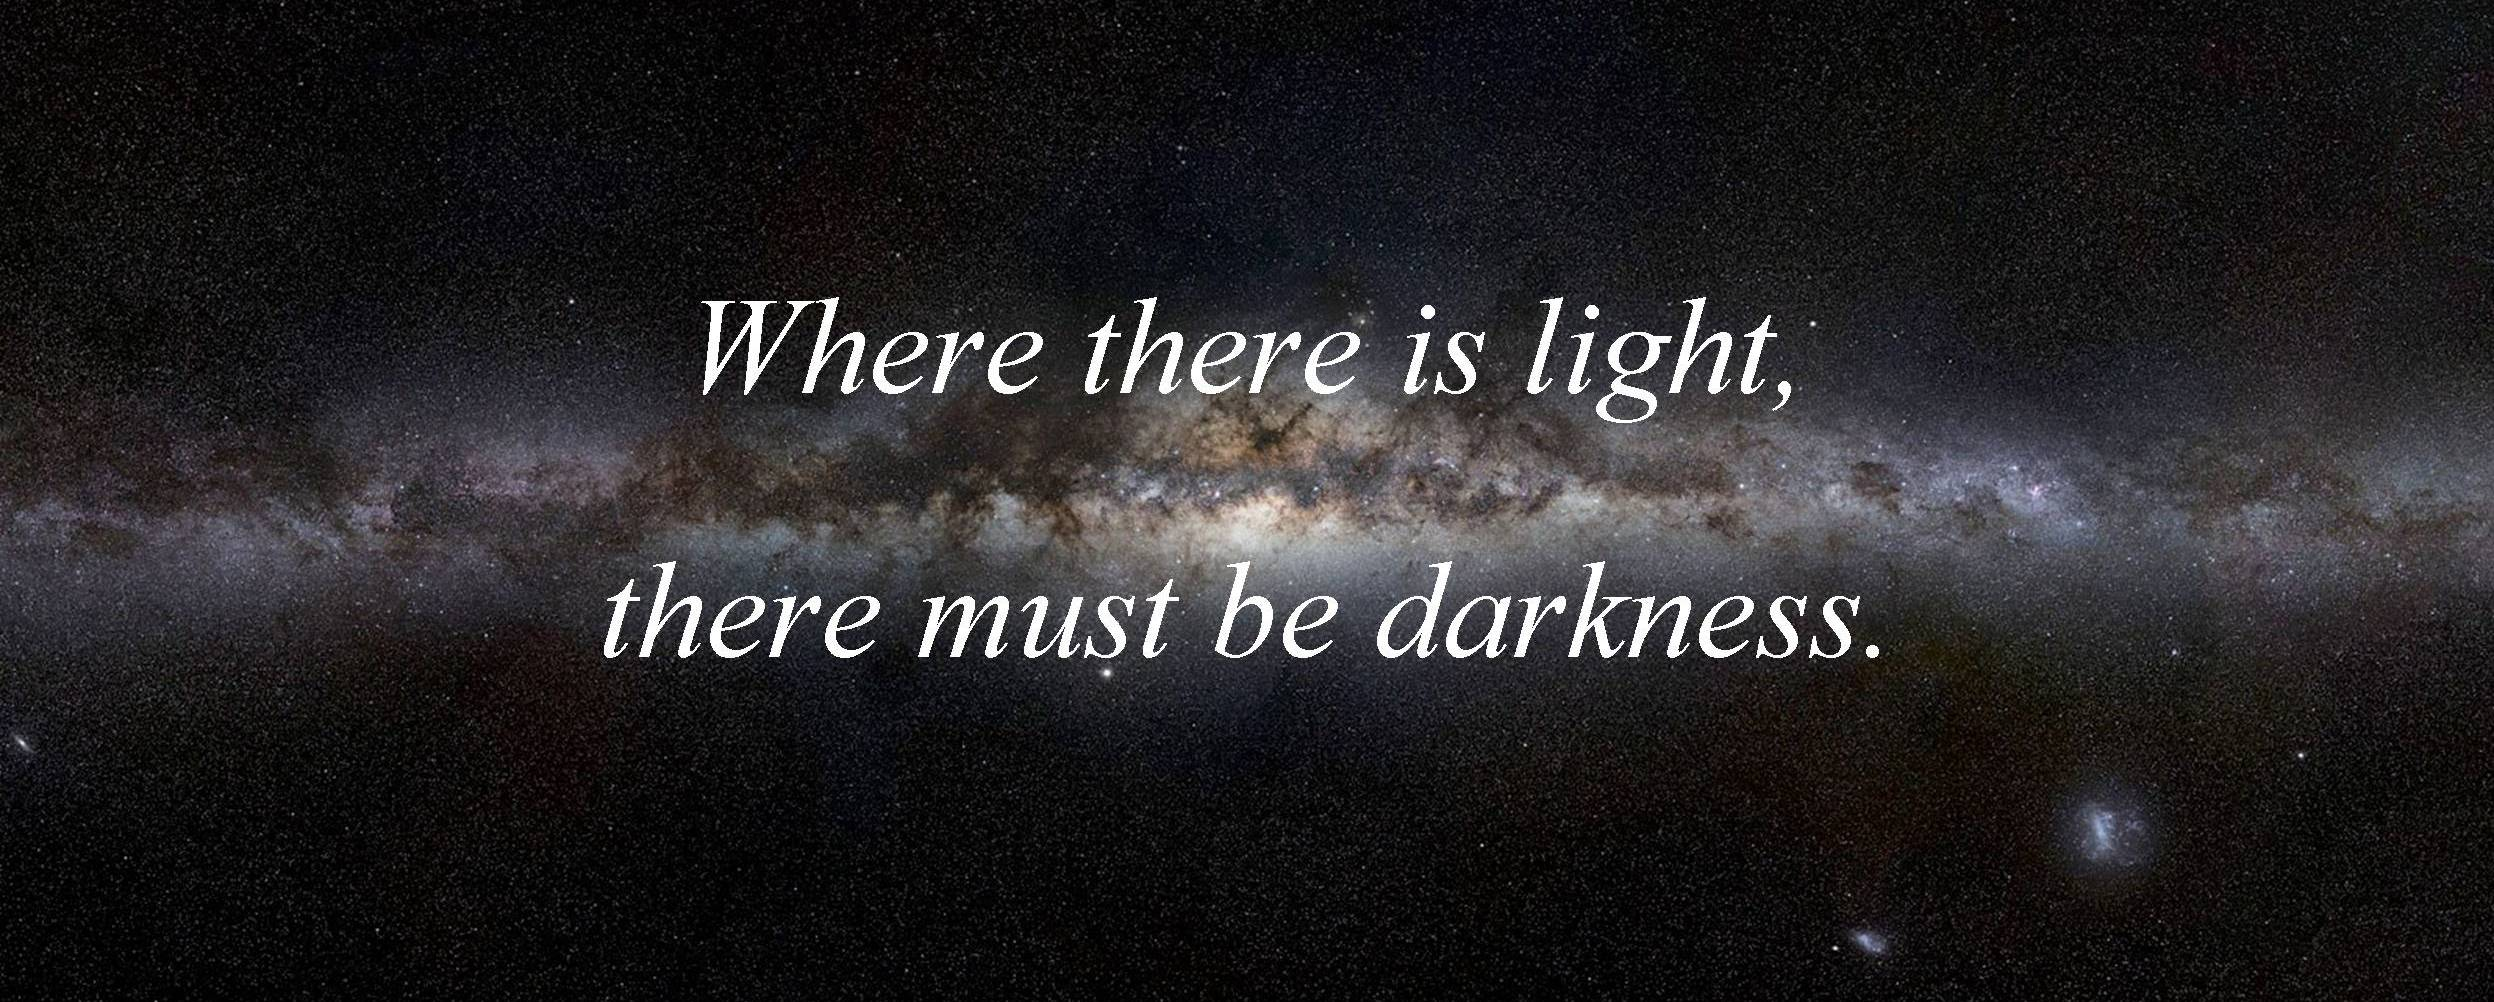 Darkness-1